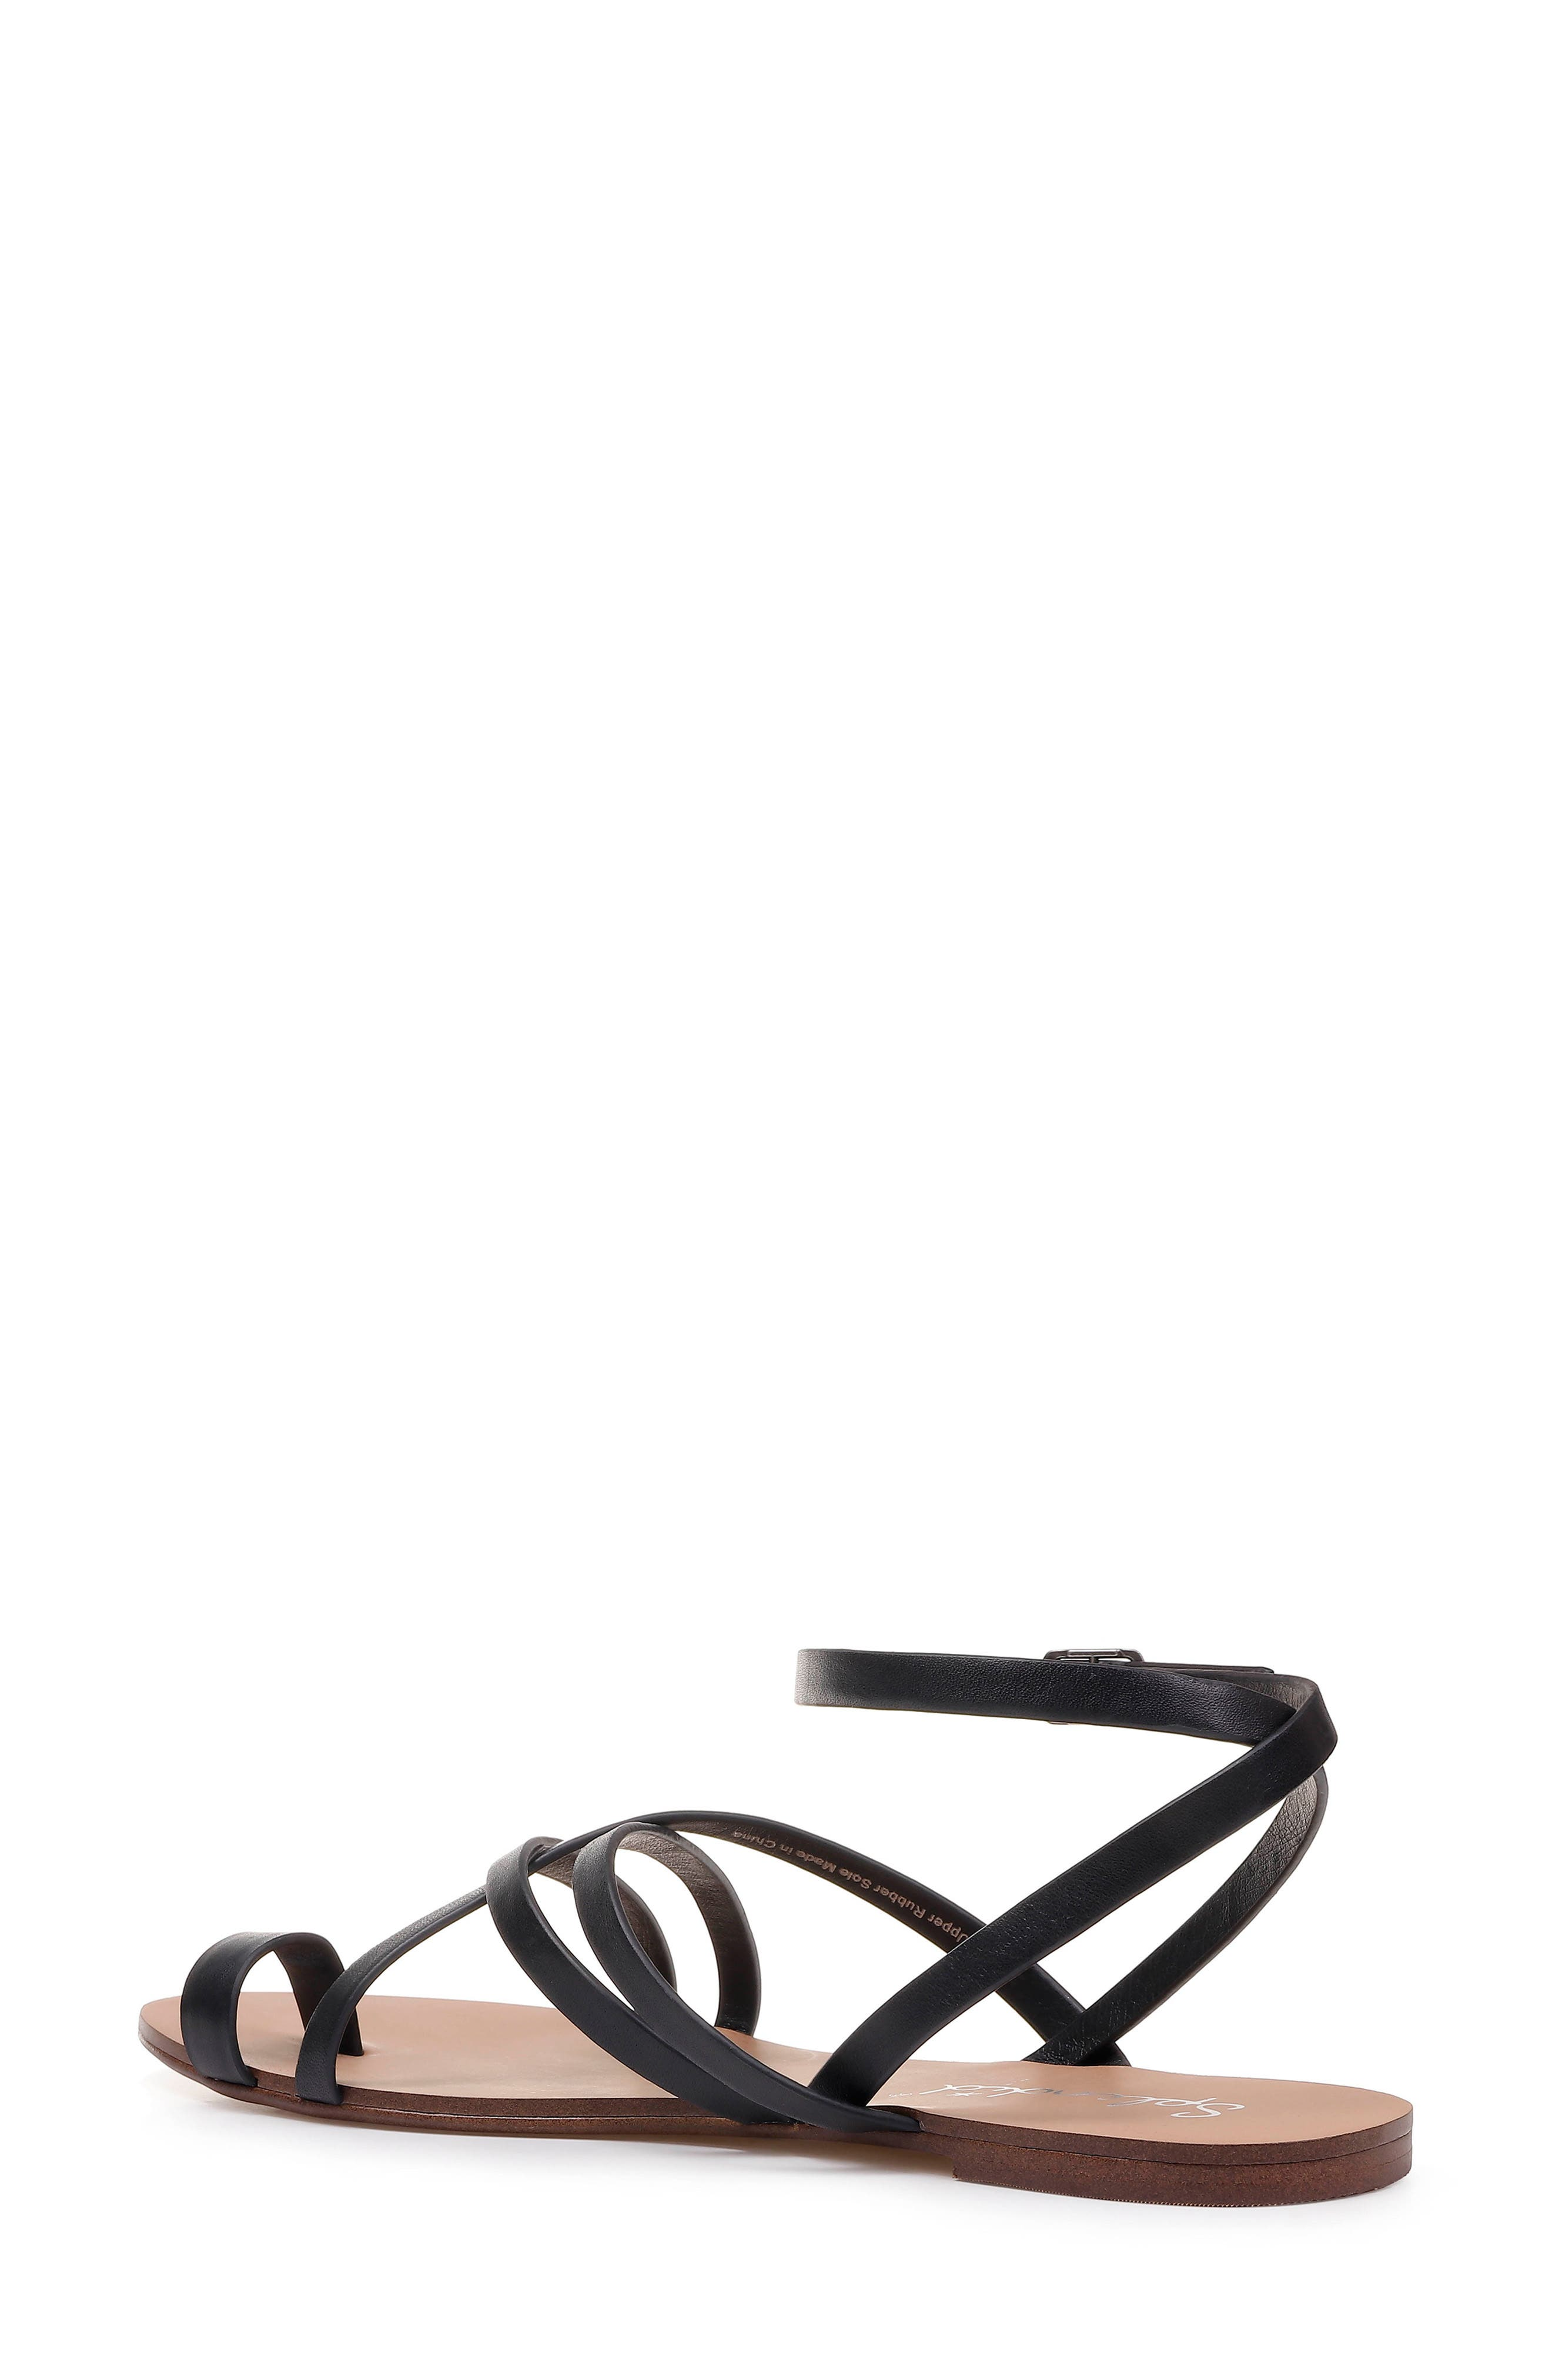 812b7c0c5c8 Women's Splendid Shoes | Nordstrom